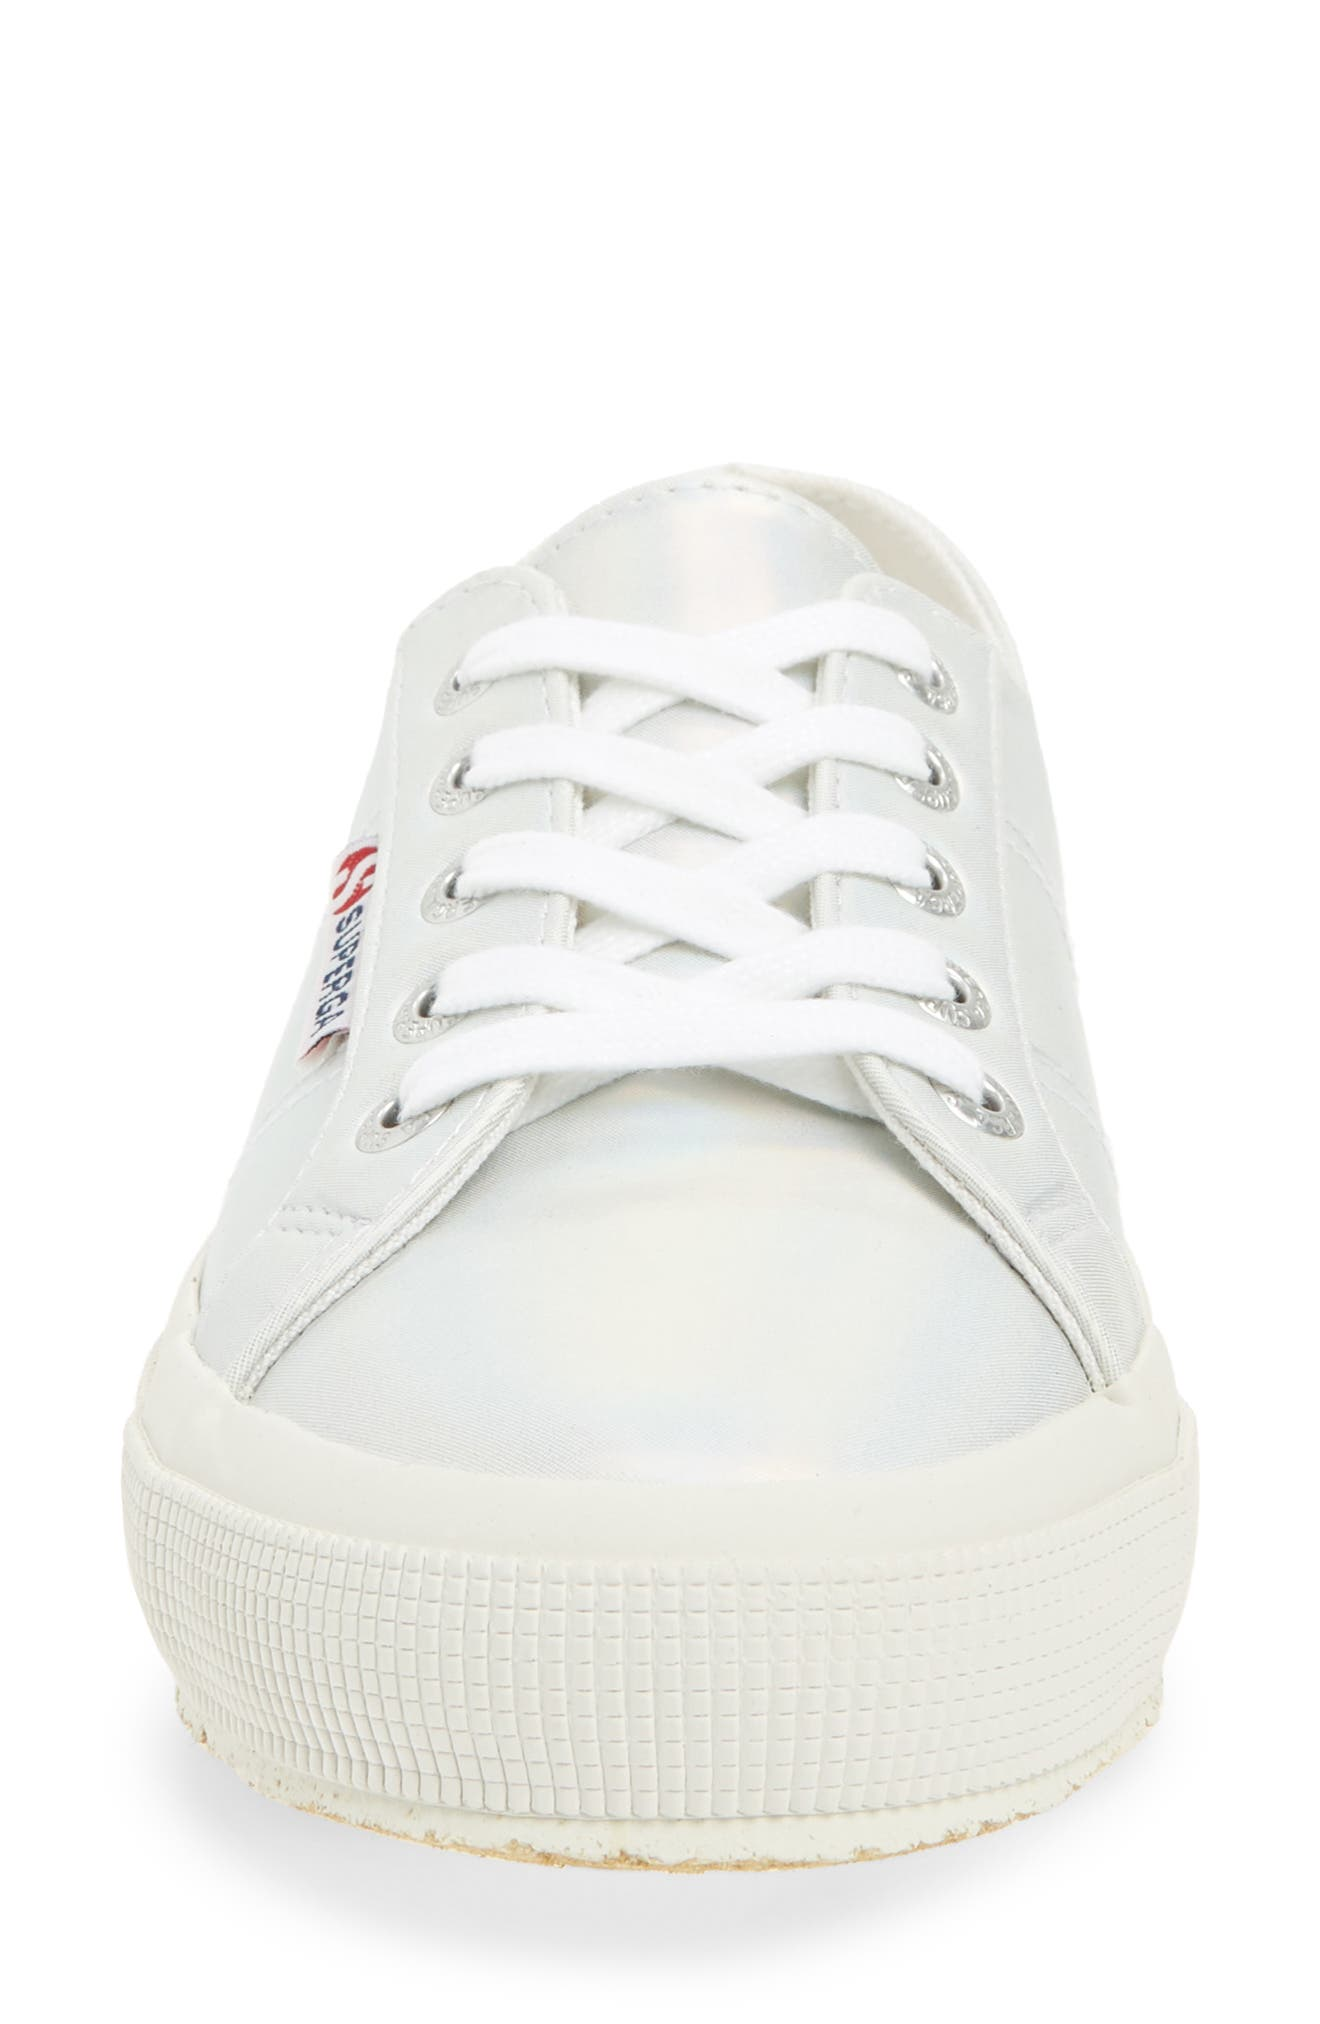 2750 Hologramw Low Top Sneaker,                             Alternate thumbnail 4, color,                             040